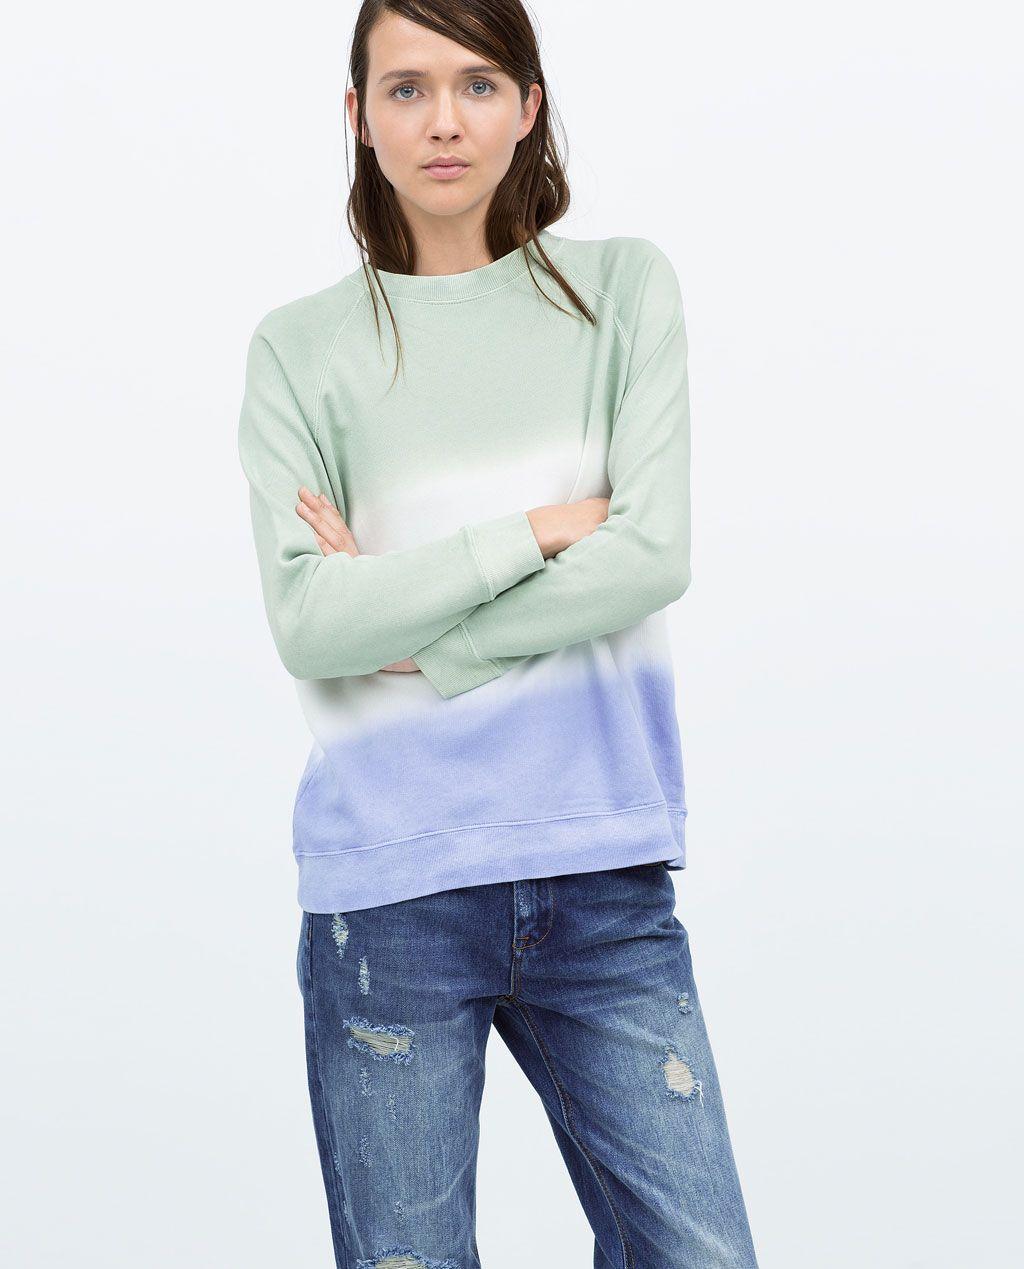 Tie Dye Sweatshirt T Shirts Woman Zara United Kingdom Sweatshirts Tie Dye Sweatshirt Sweatshirts Women [ 1269 x 1024 Pixel ]